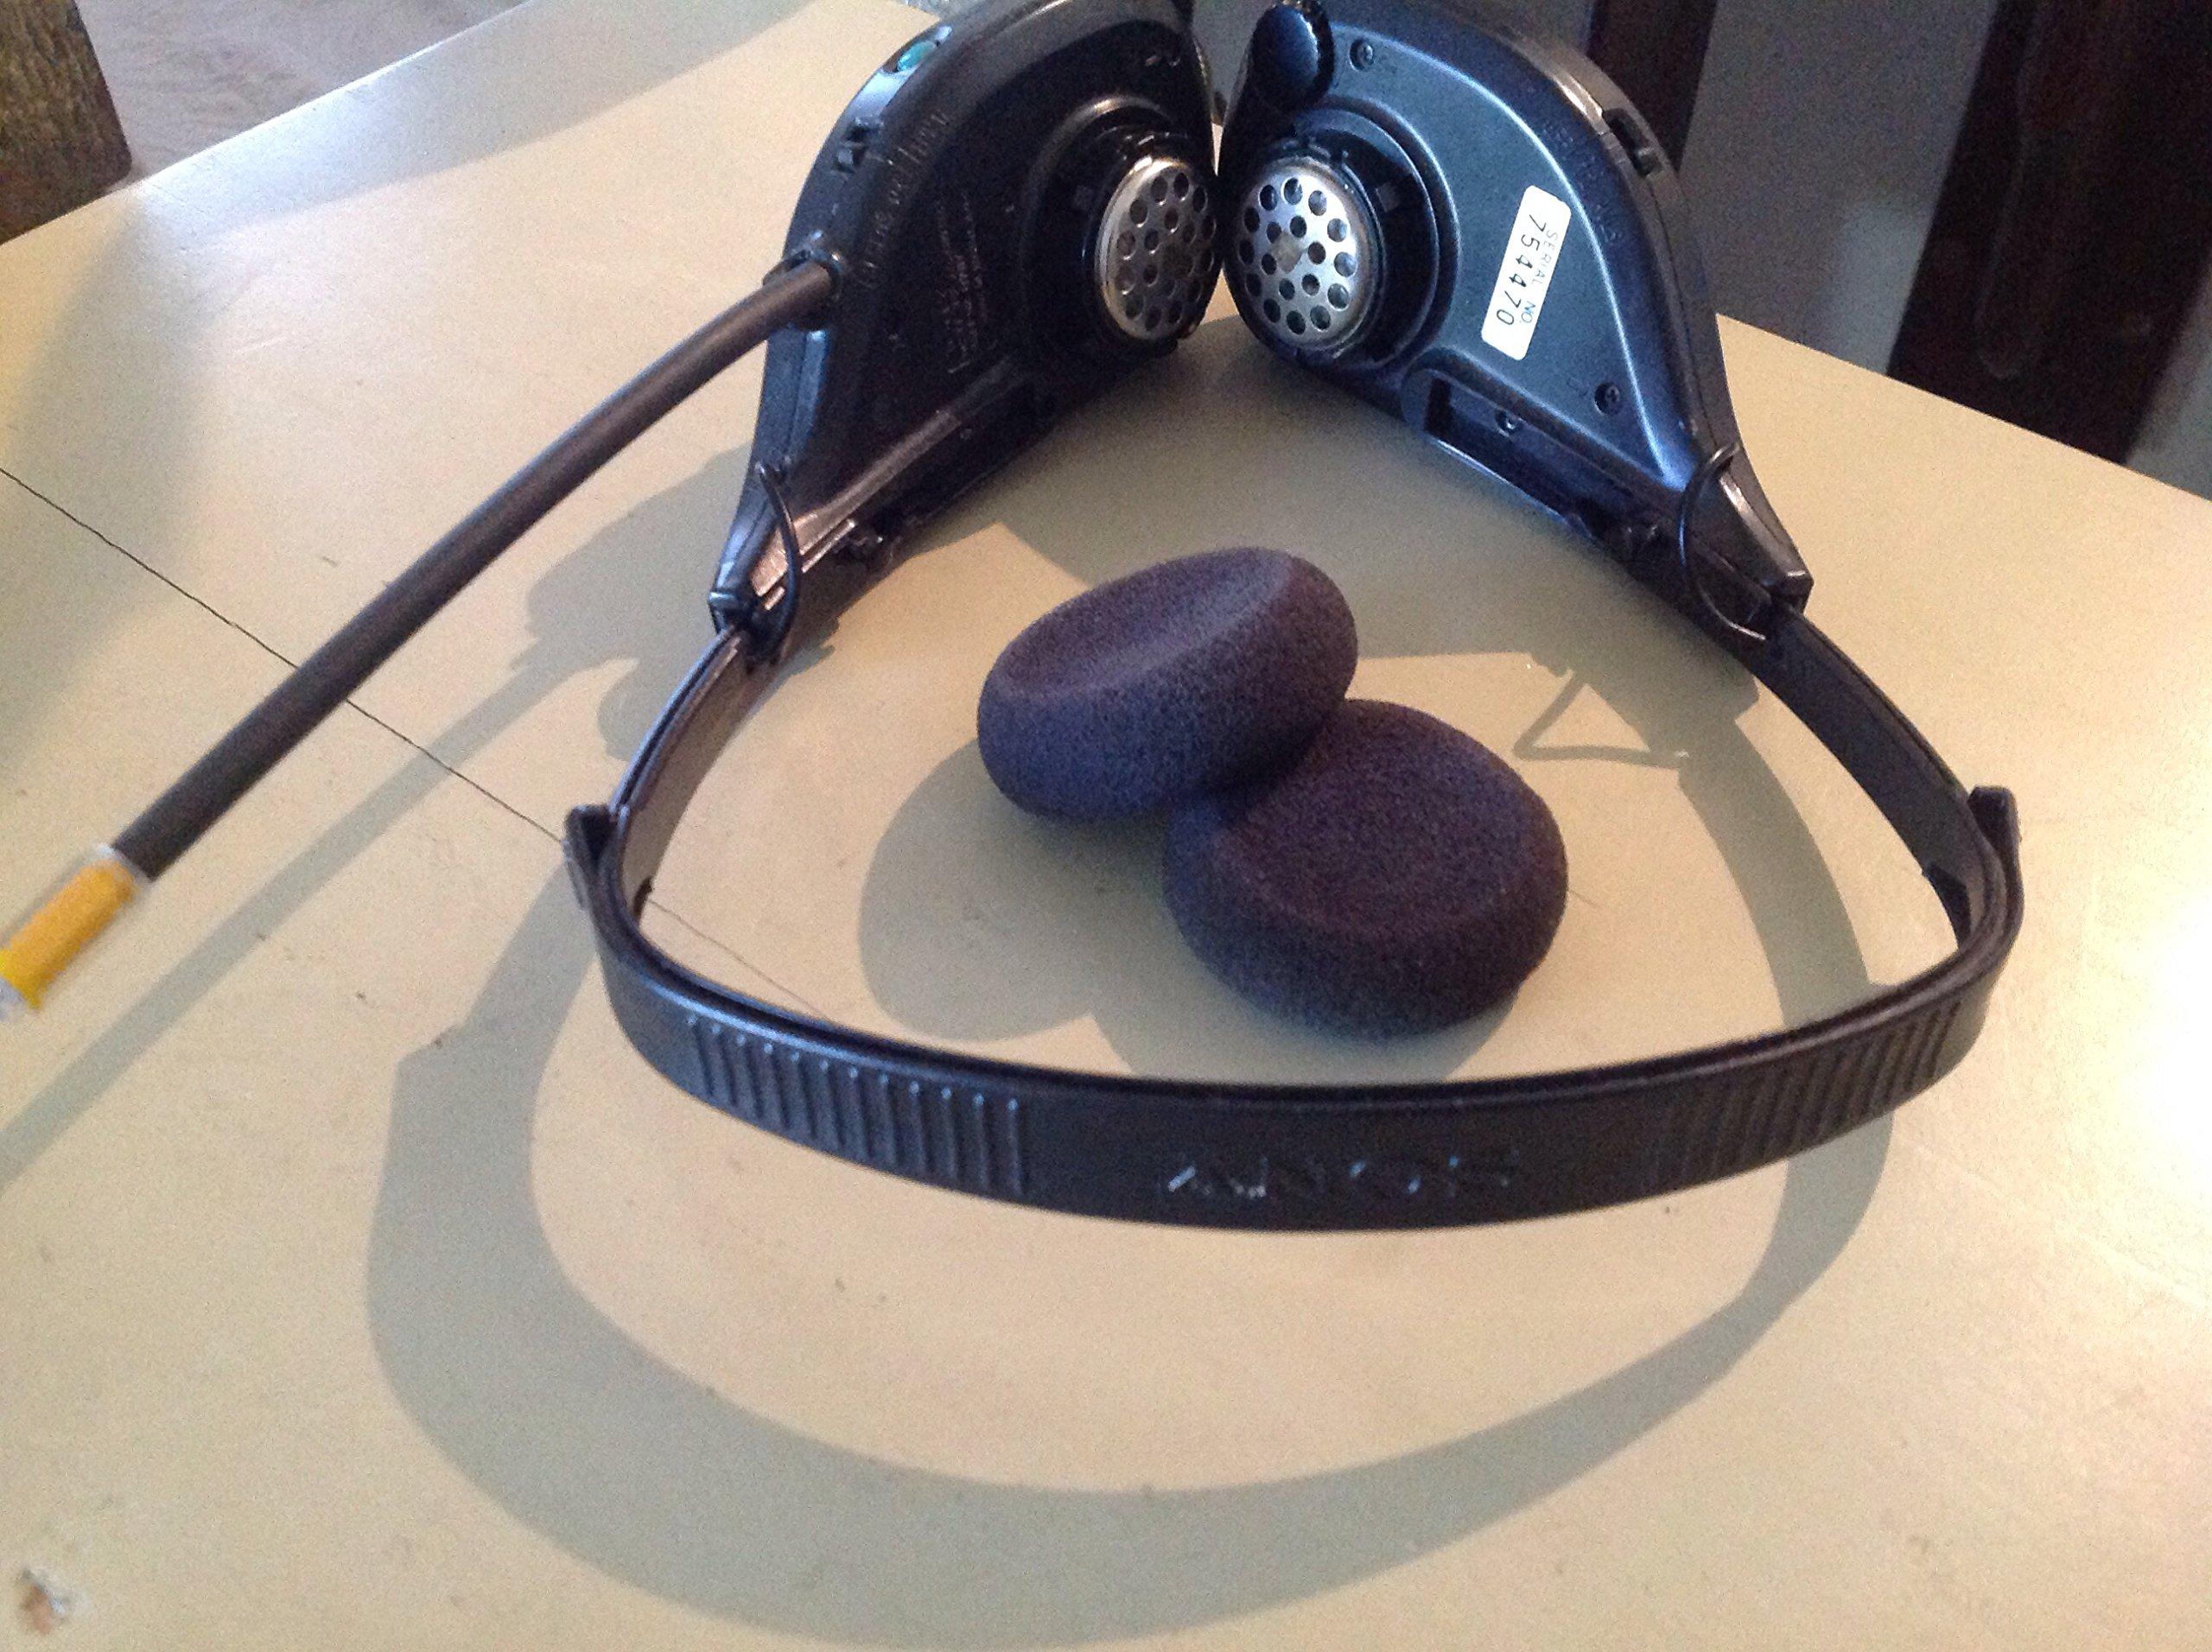 Sony SRF-HM22 AM/FM Headphone Radio Walkman